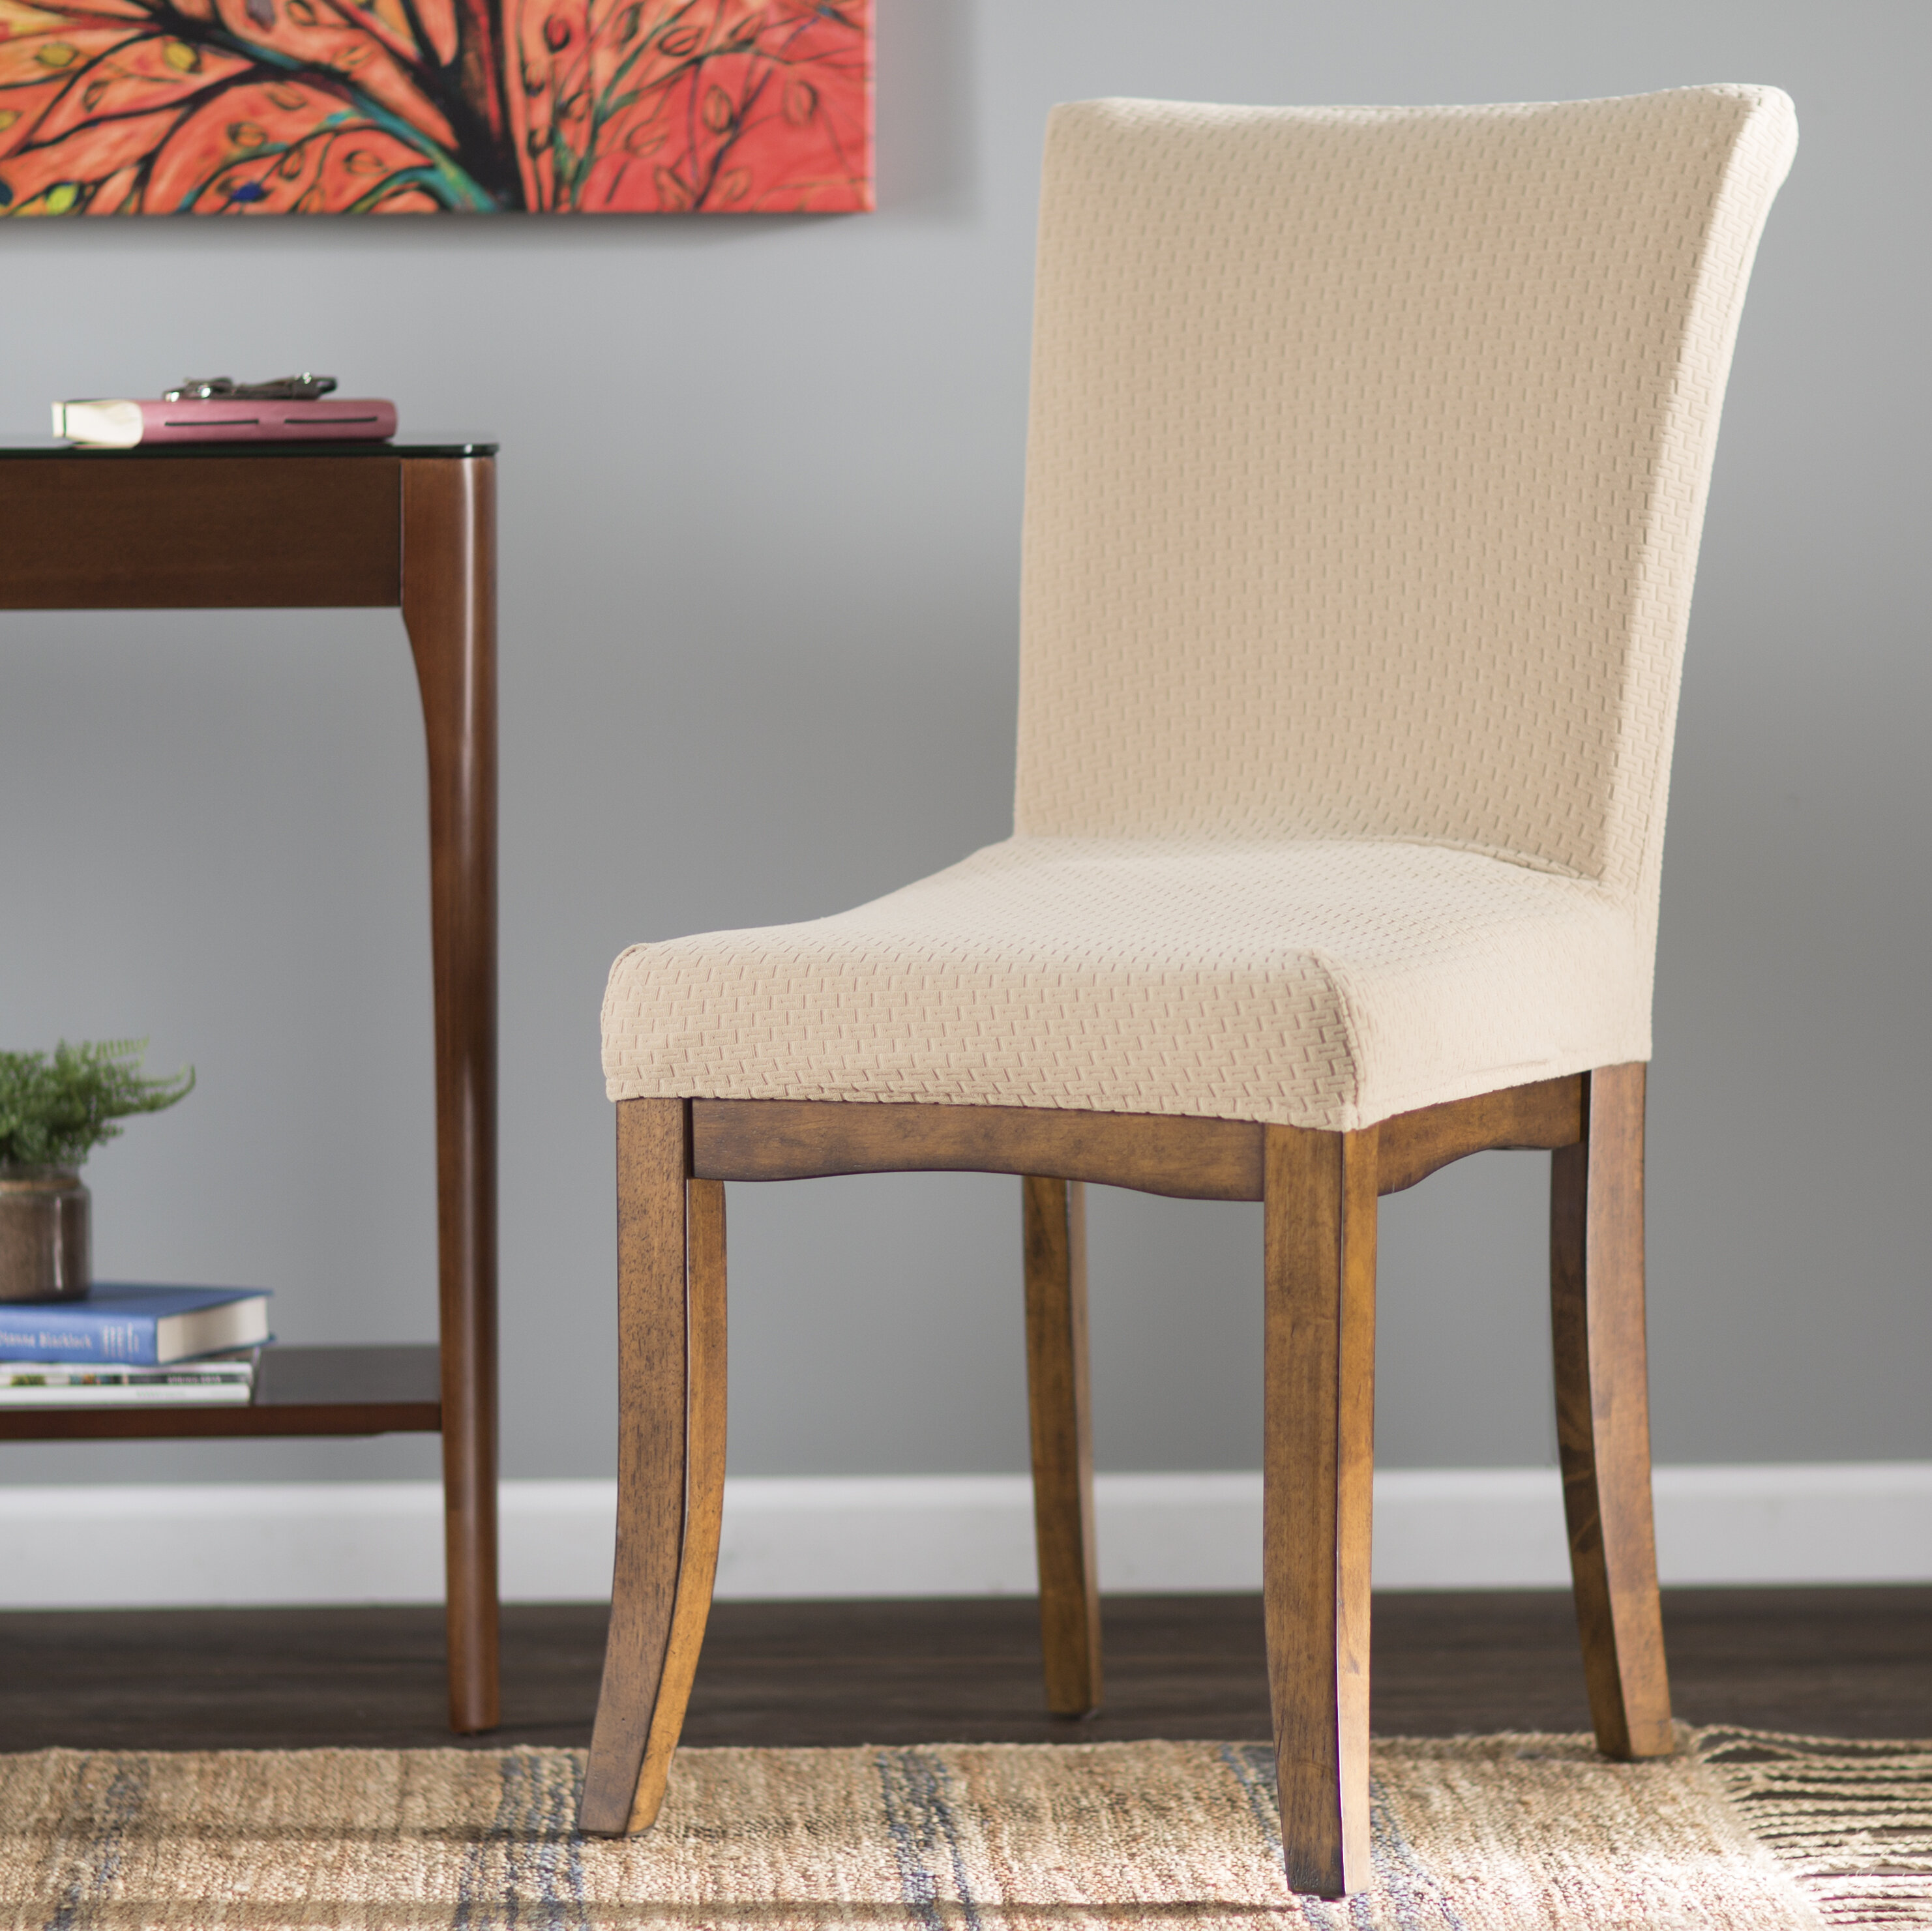 Red Barrel Studio Dining Room Chair Slipcover & Reviews | Wayfair